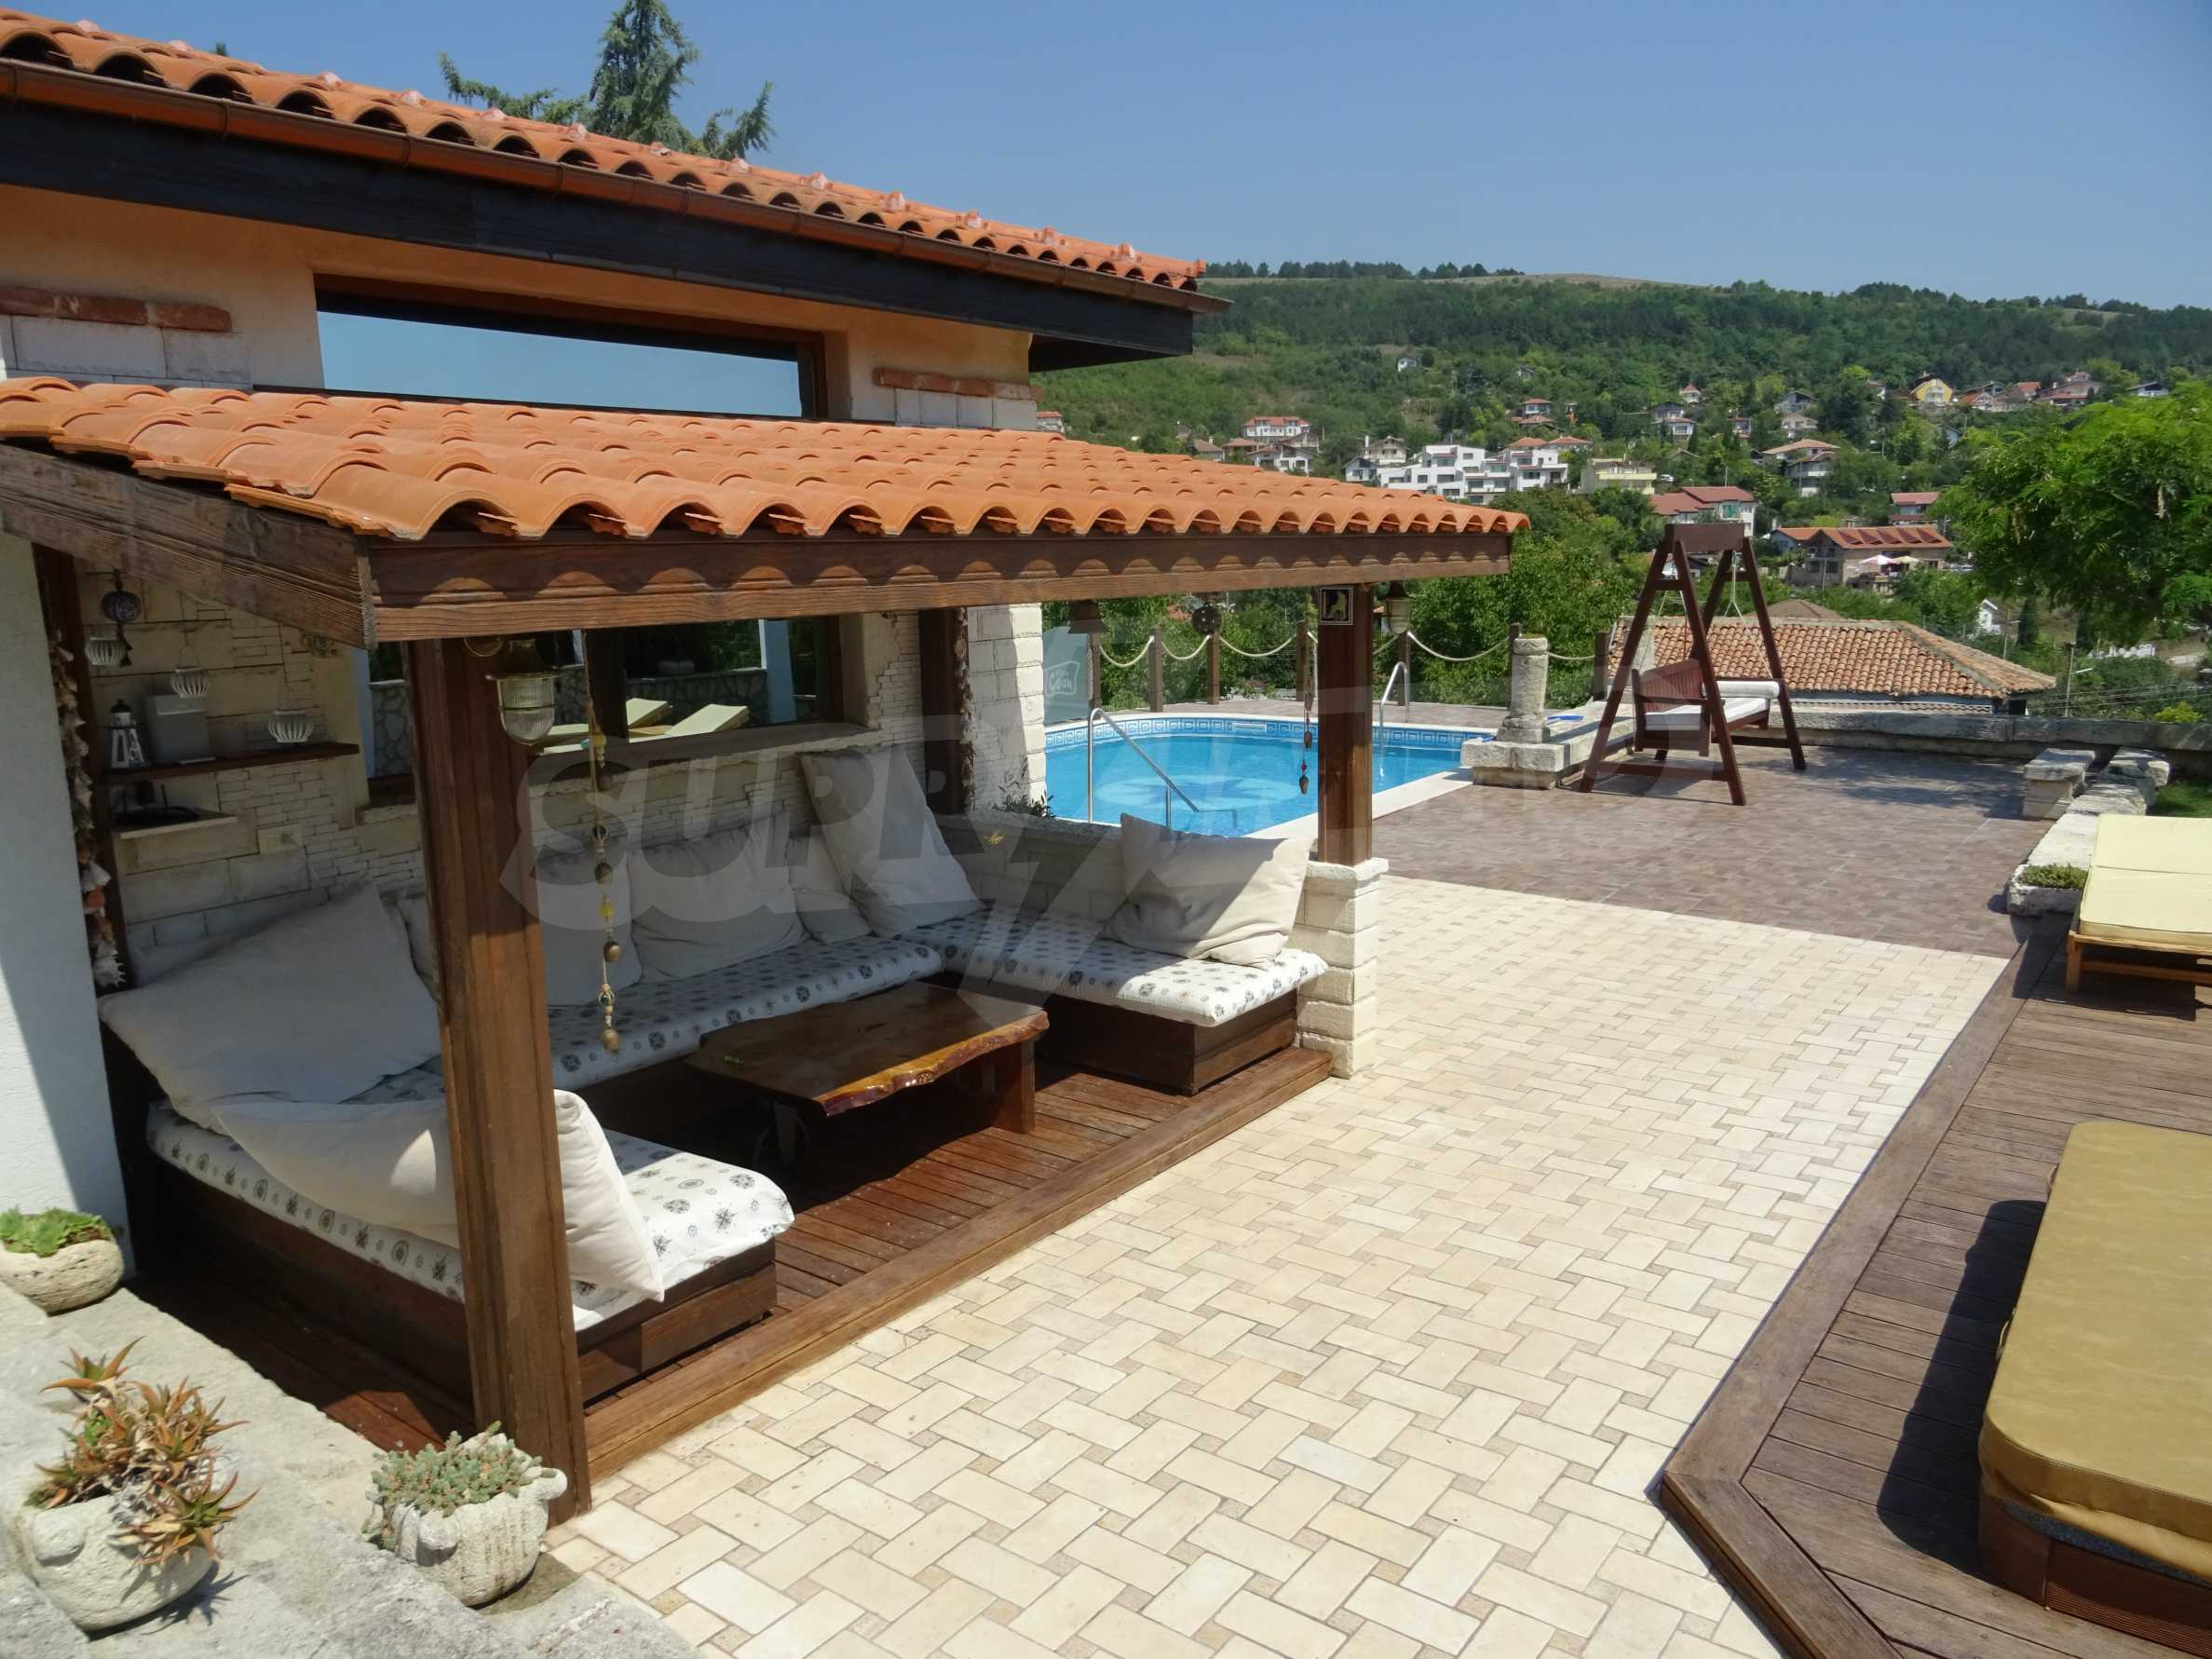 The Mediterranean style - a sense of luxury 2